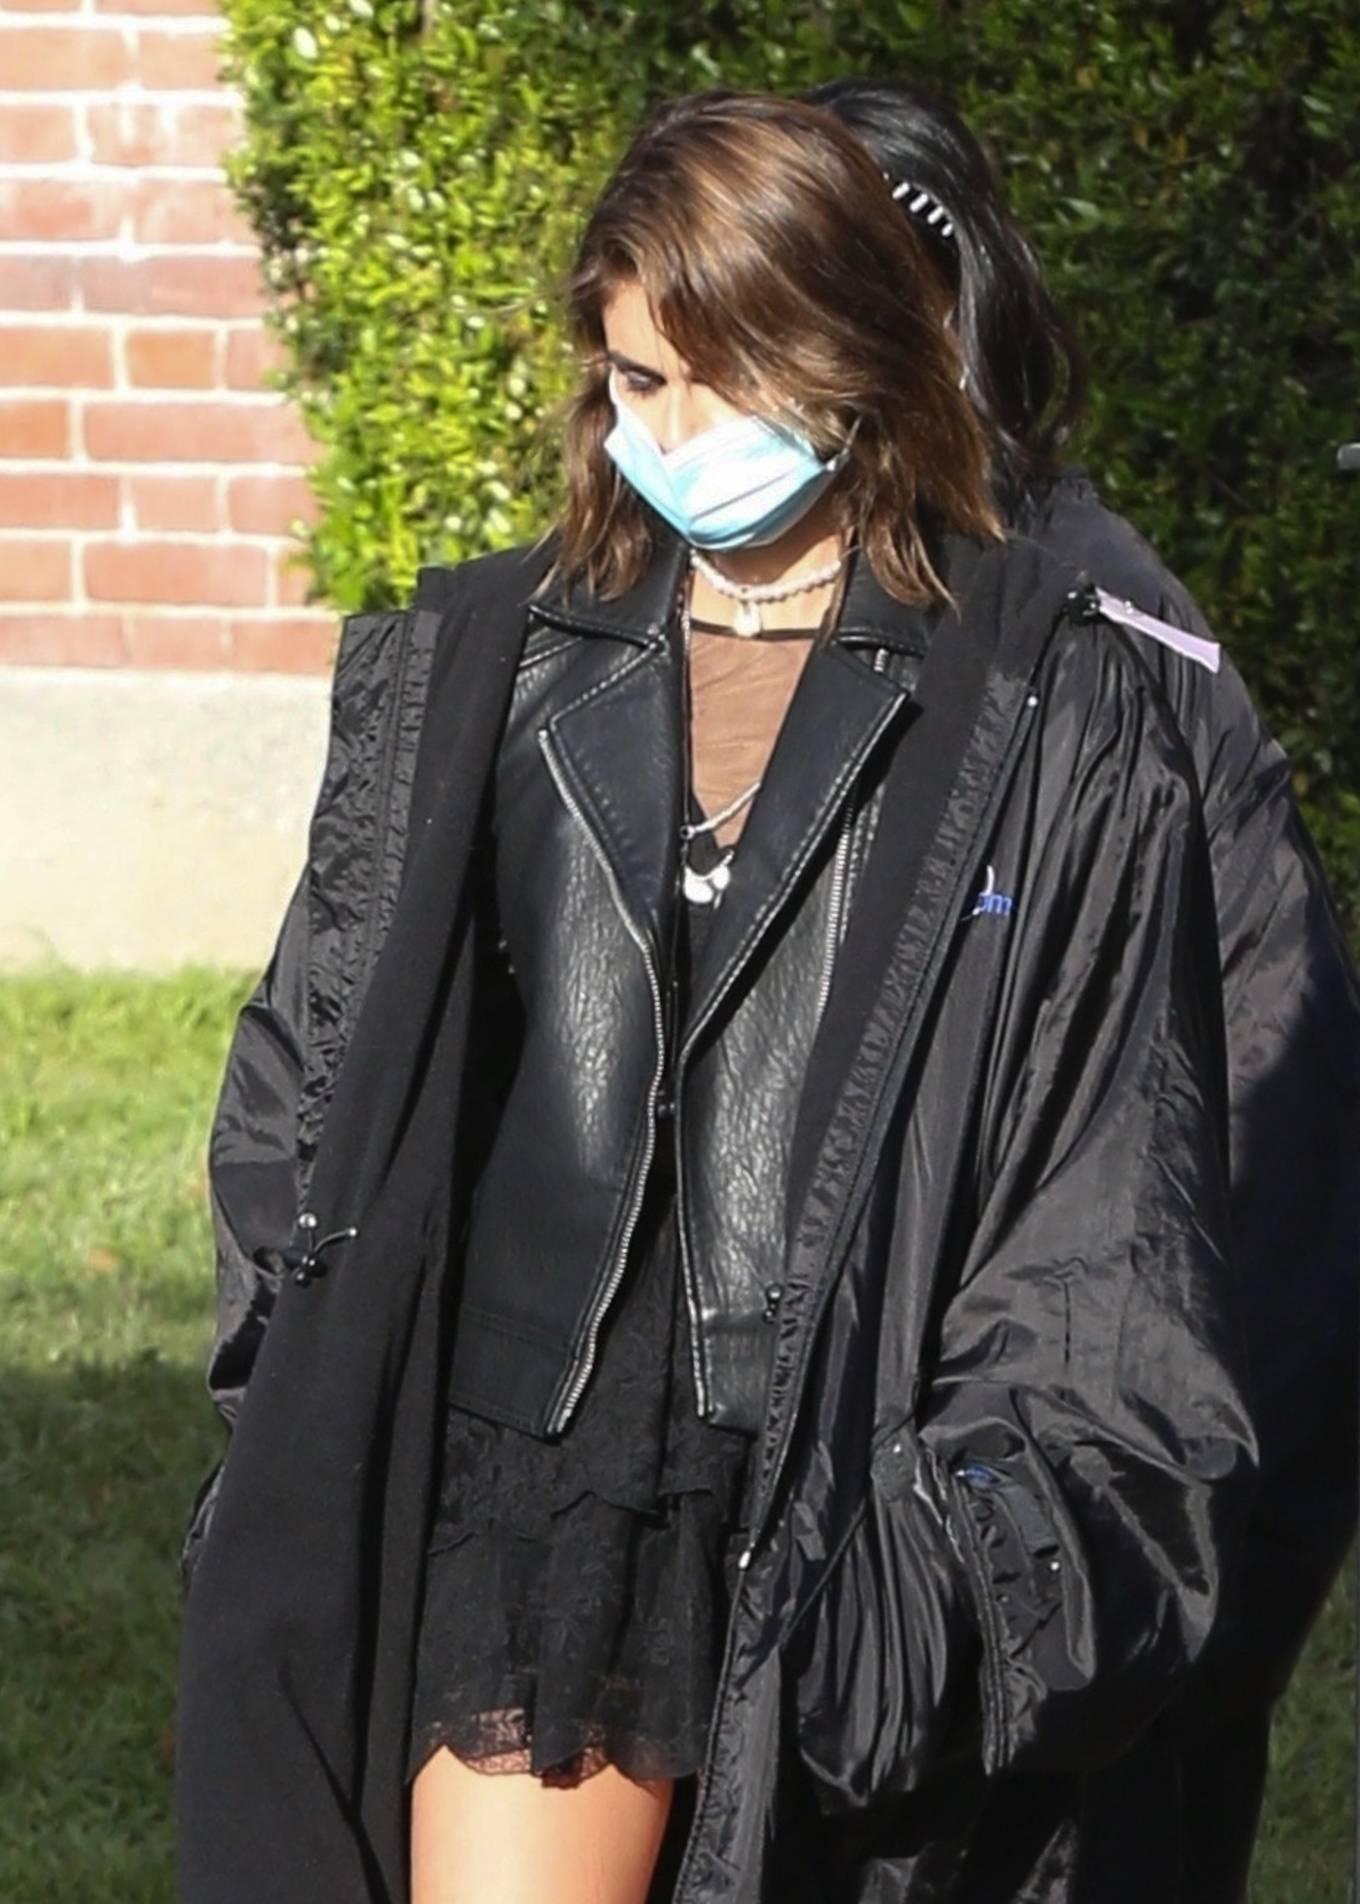 Kaia Gerber 2021 : Kaia Gerber – Seen at American Horror Story Season 10 set in Burbank-08